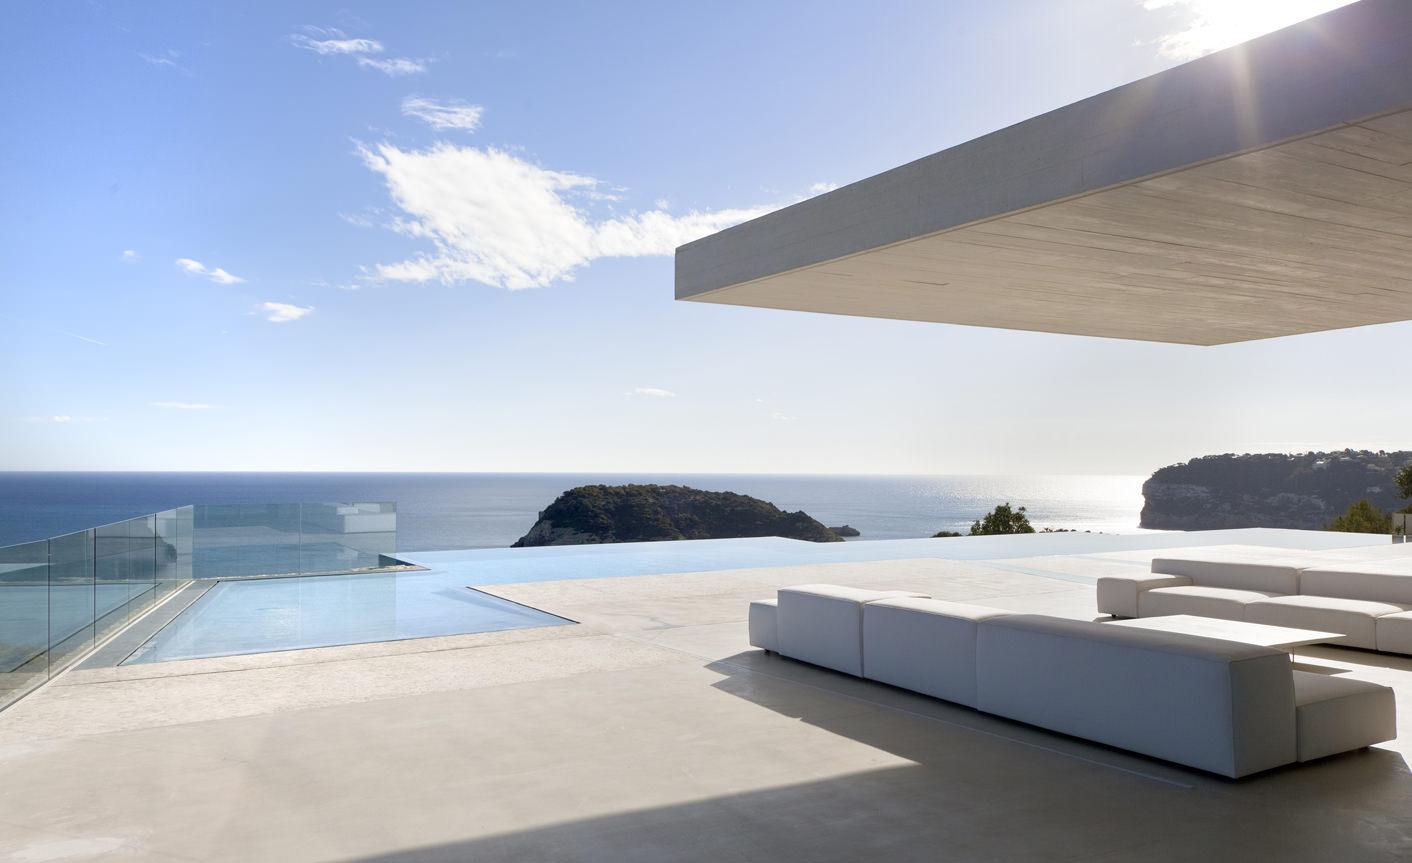 casa-sardinera-javea-alicante-ramon-esteve-design-architecture-effronte-04